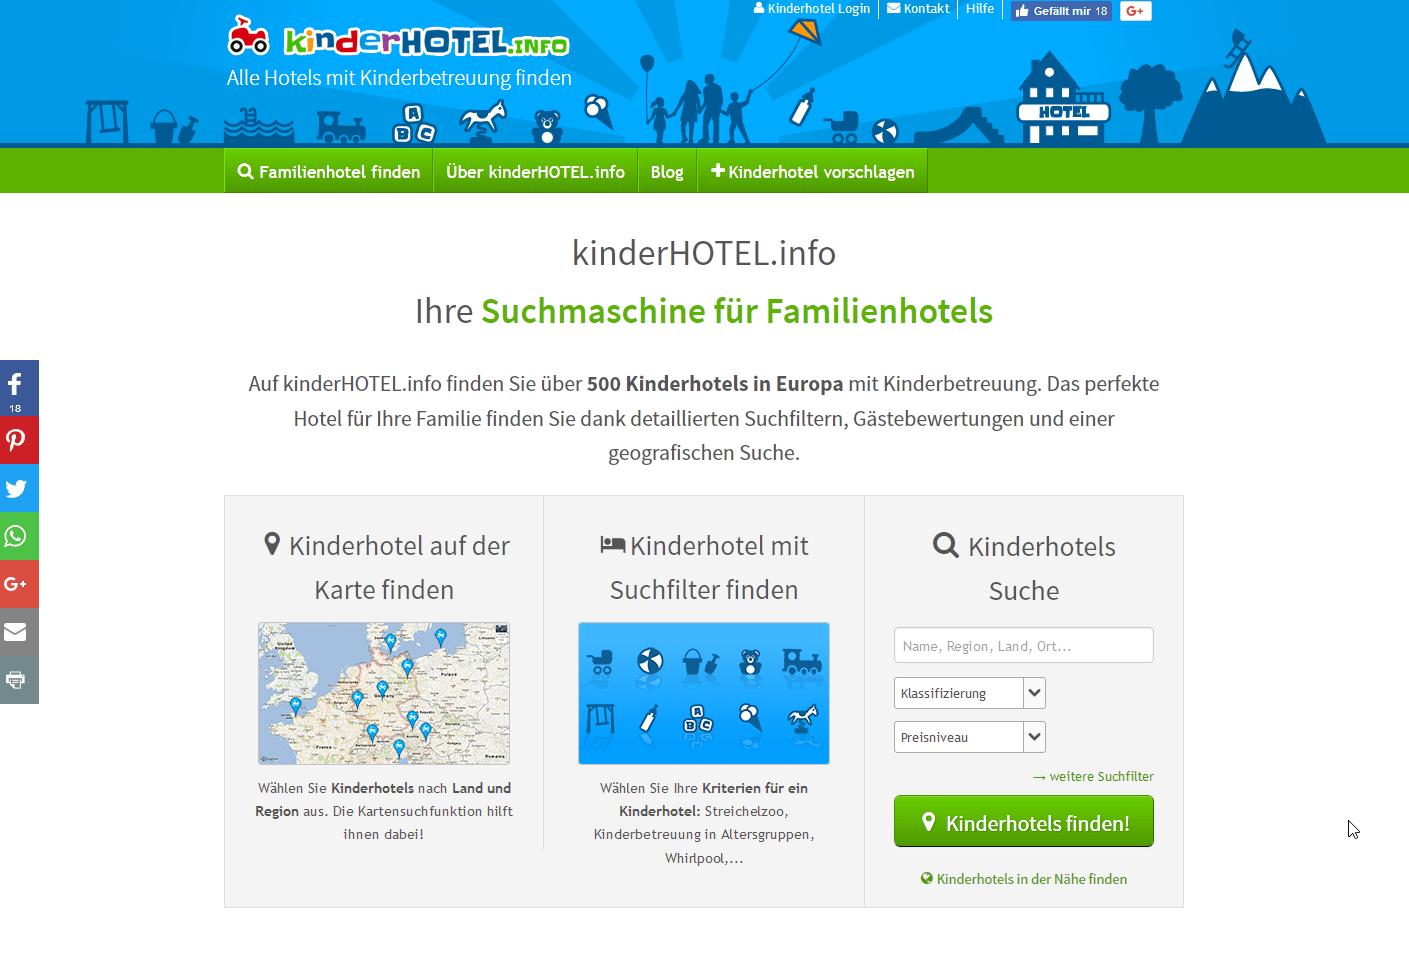 Branchenportal templates und design inspiration discoverize for Design kinderhotel